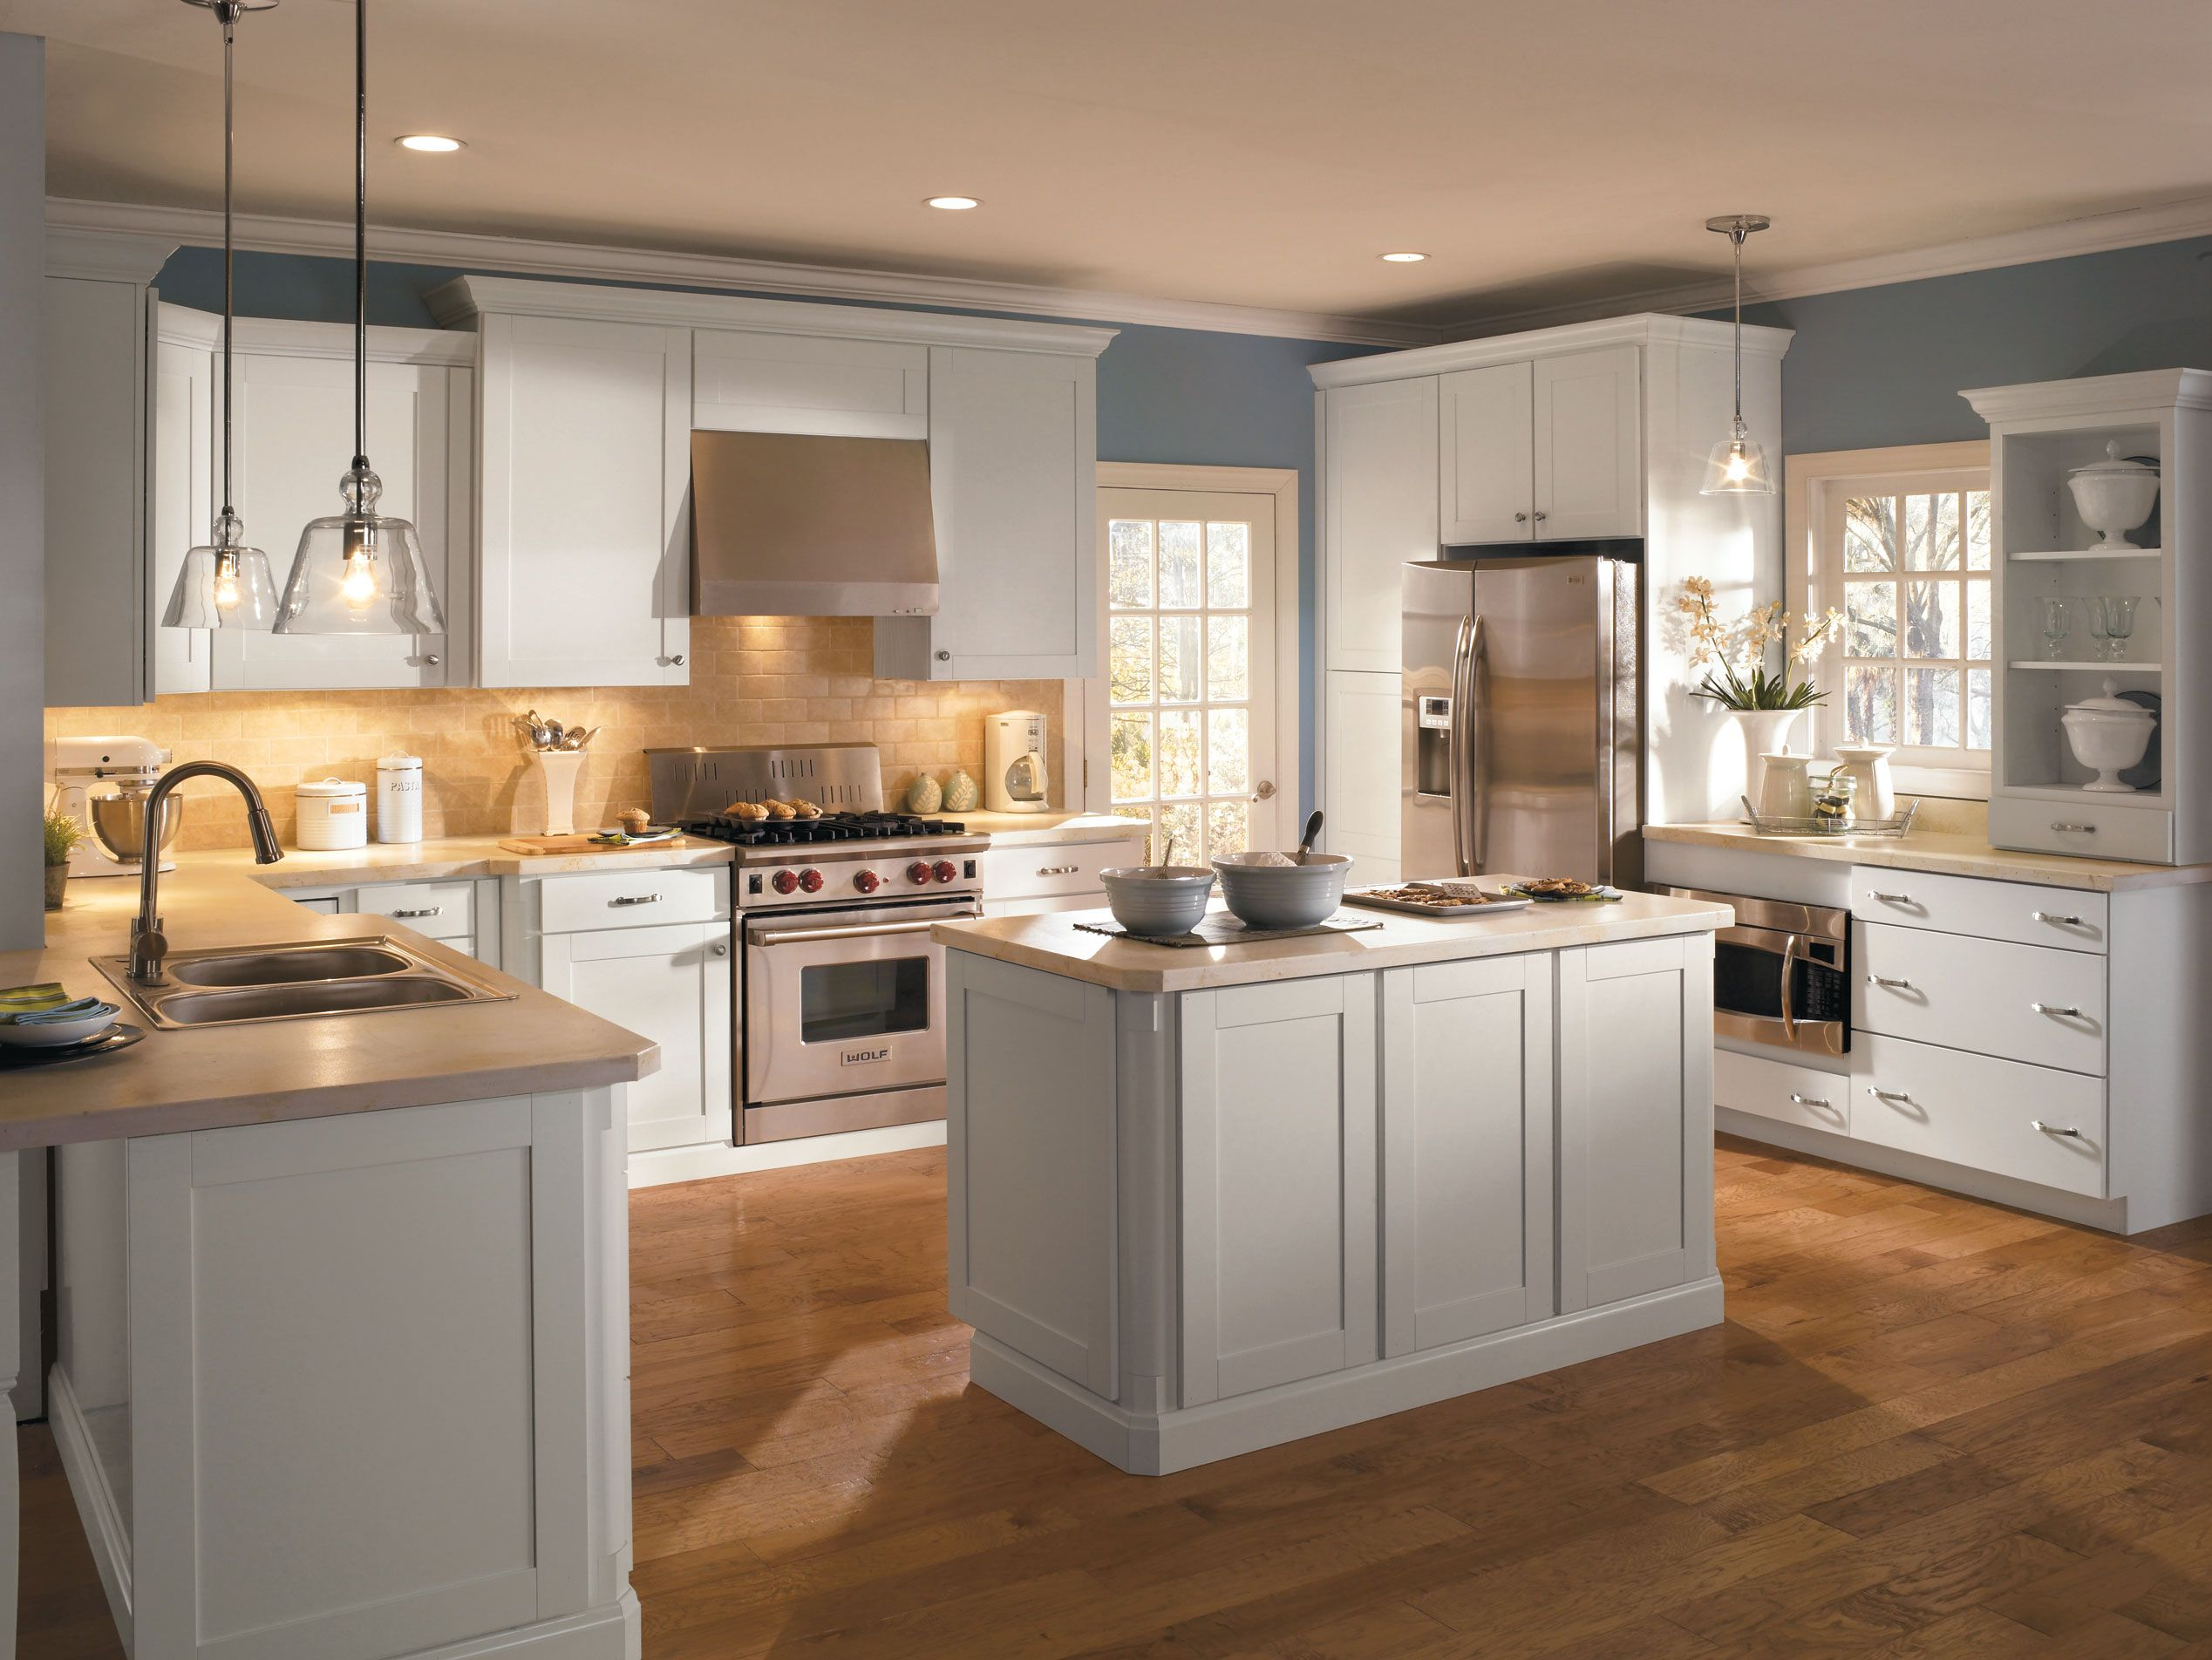 Inspiredthe Sensibility Of The Distinctive Shaker Style Delectable Small Kitchen Interior Design Decorating Inspiration